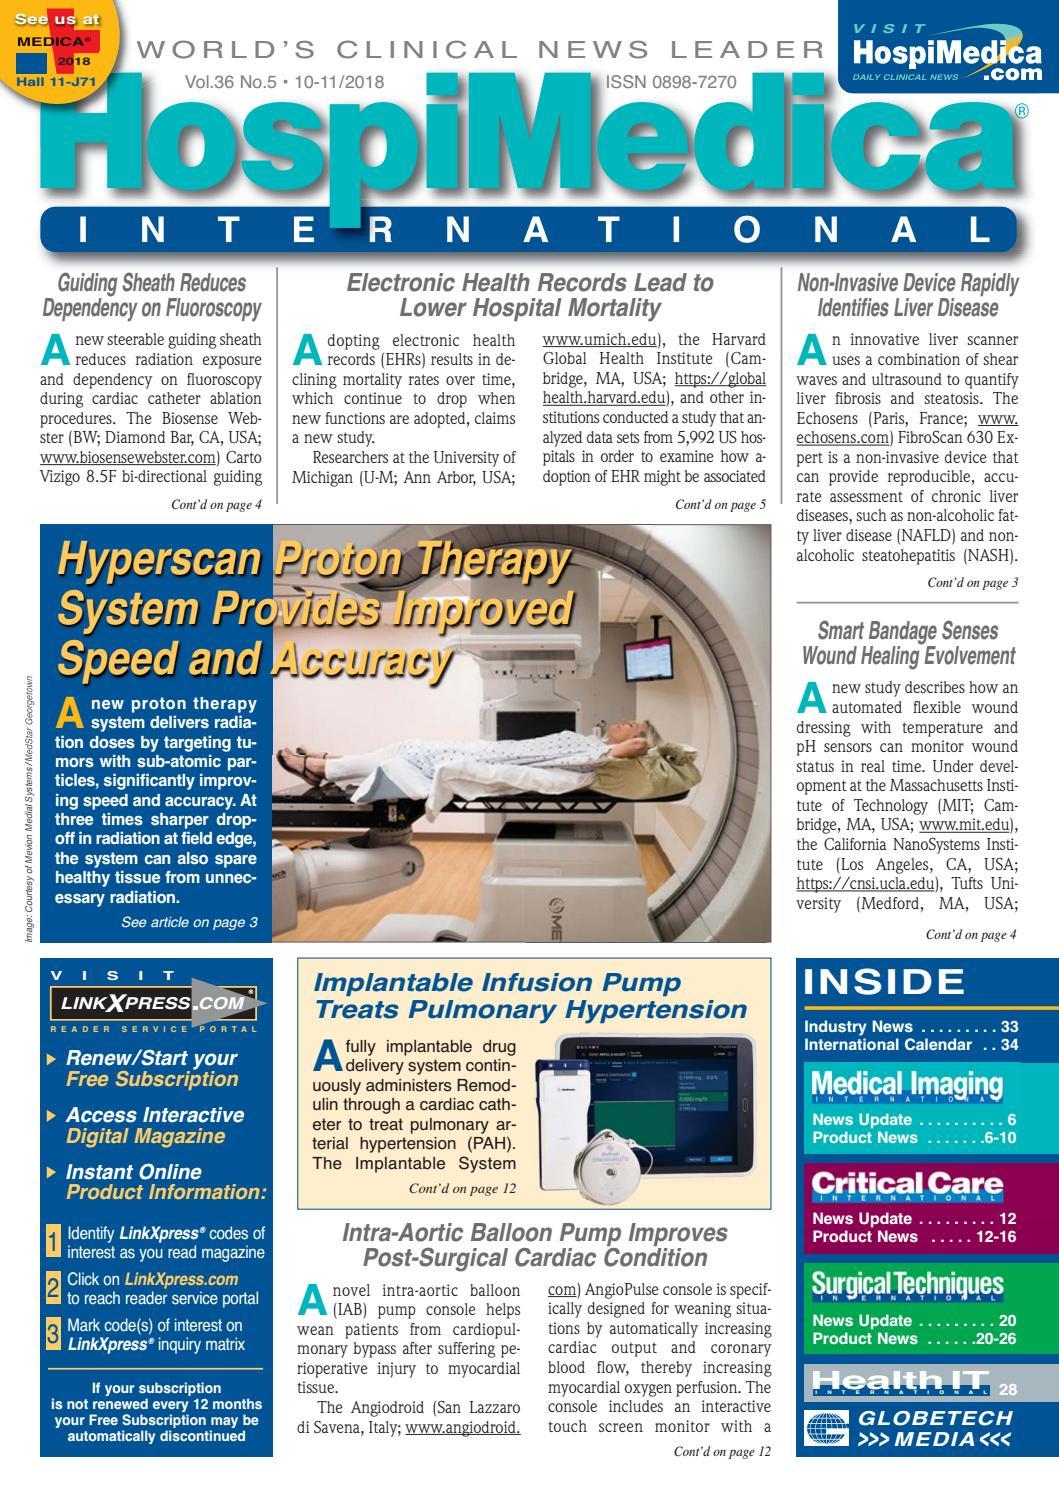 HospiMedica International November 2018 by Globetech - issuu